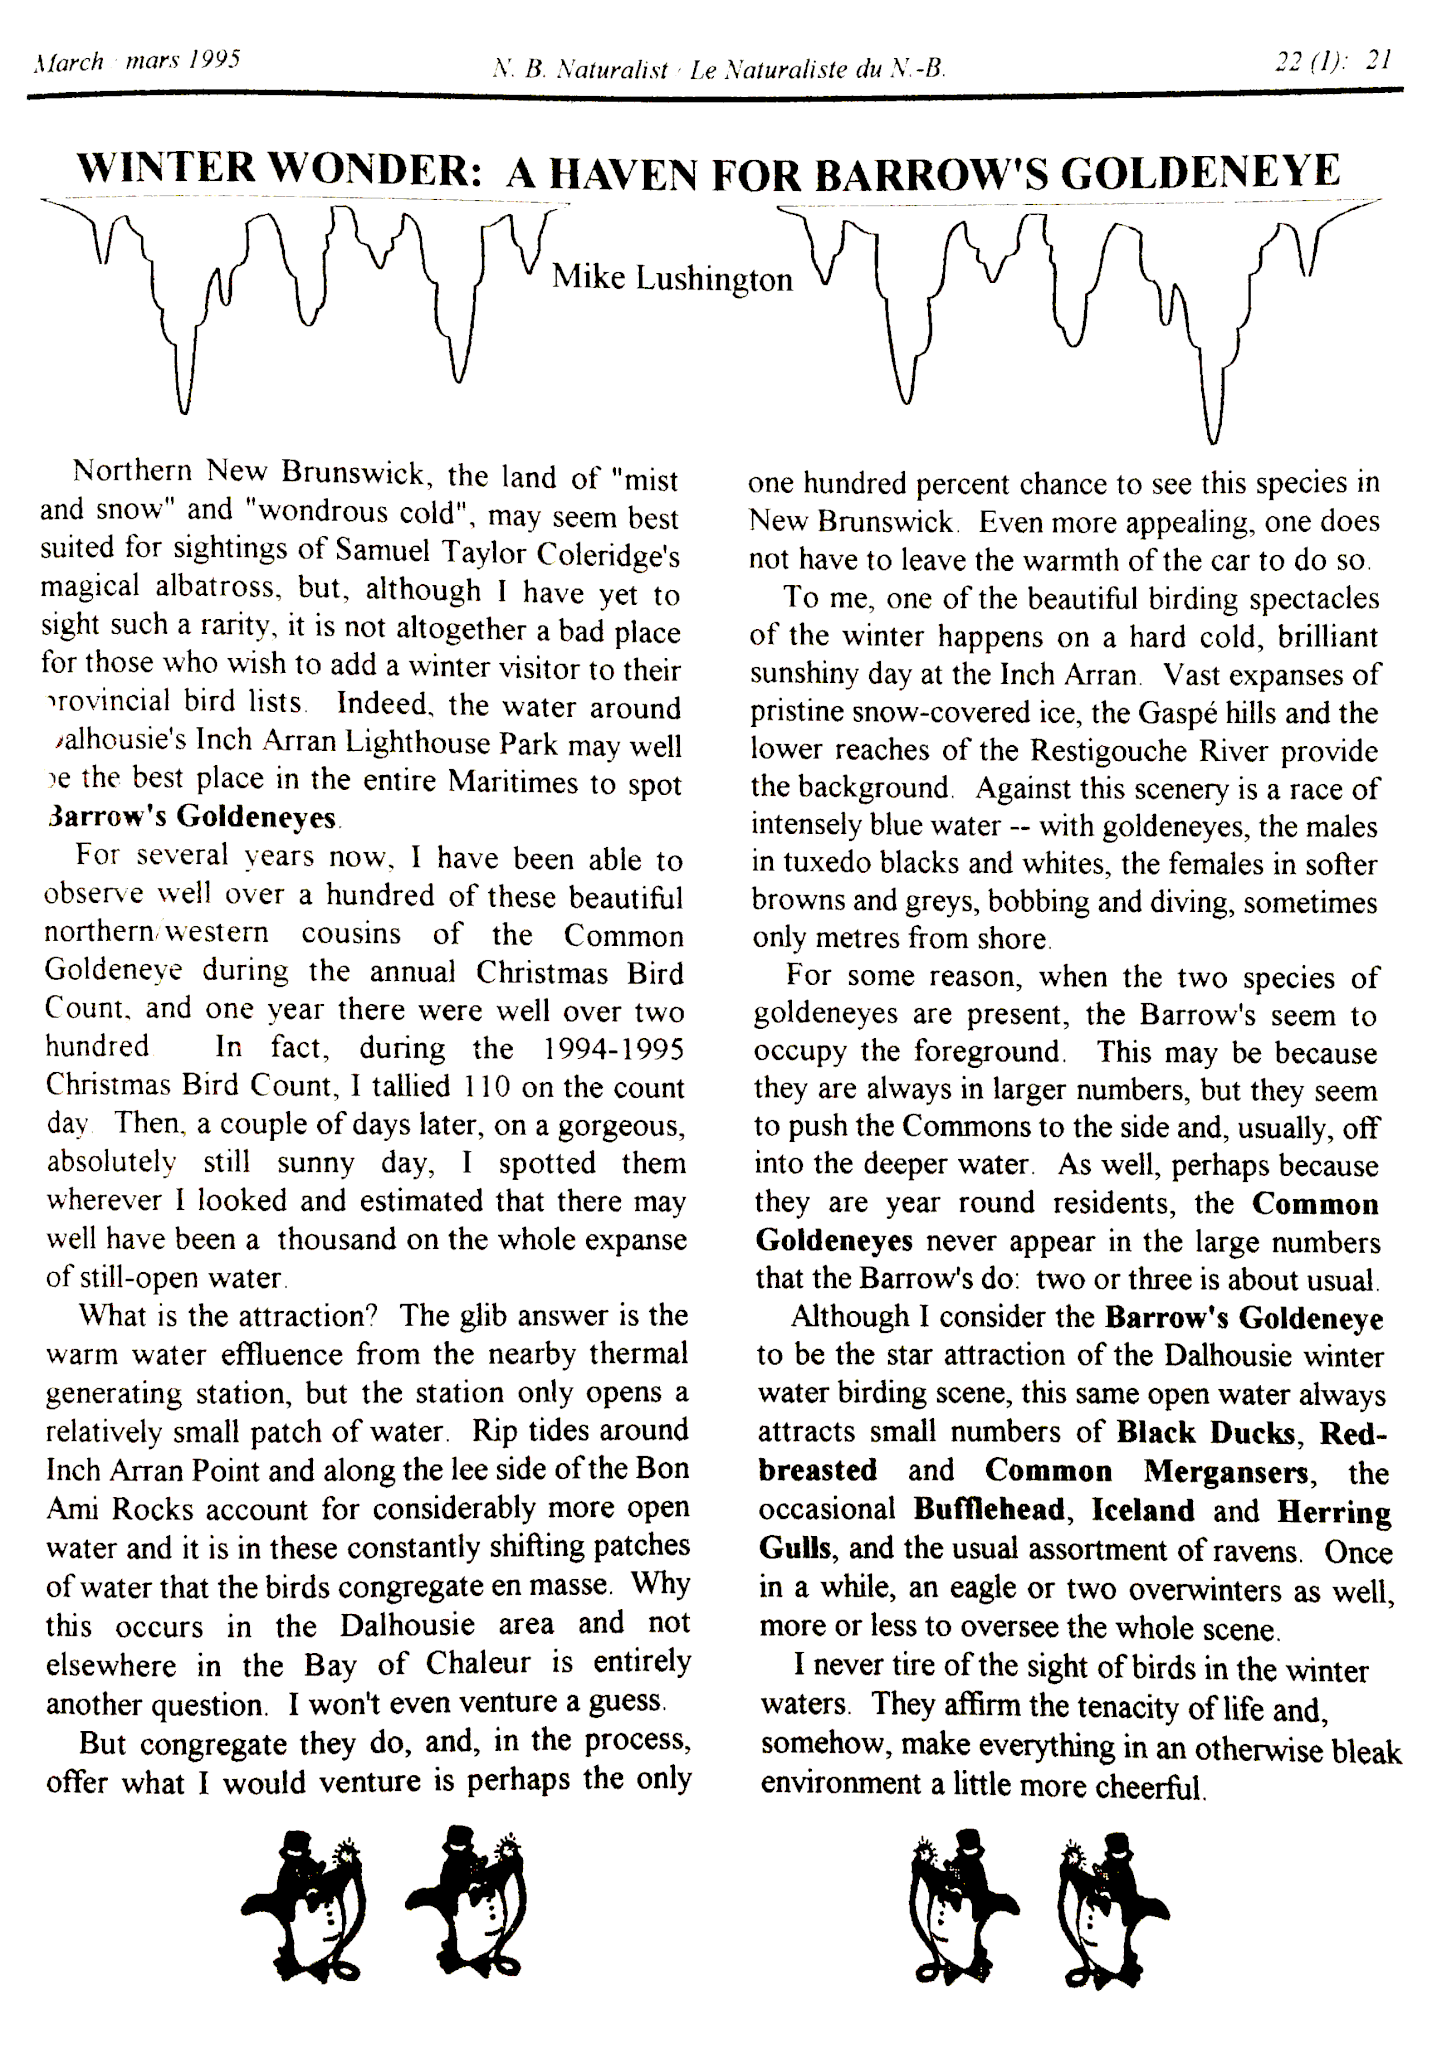 Lushington Article 1995